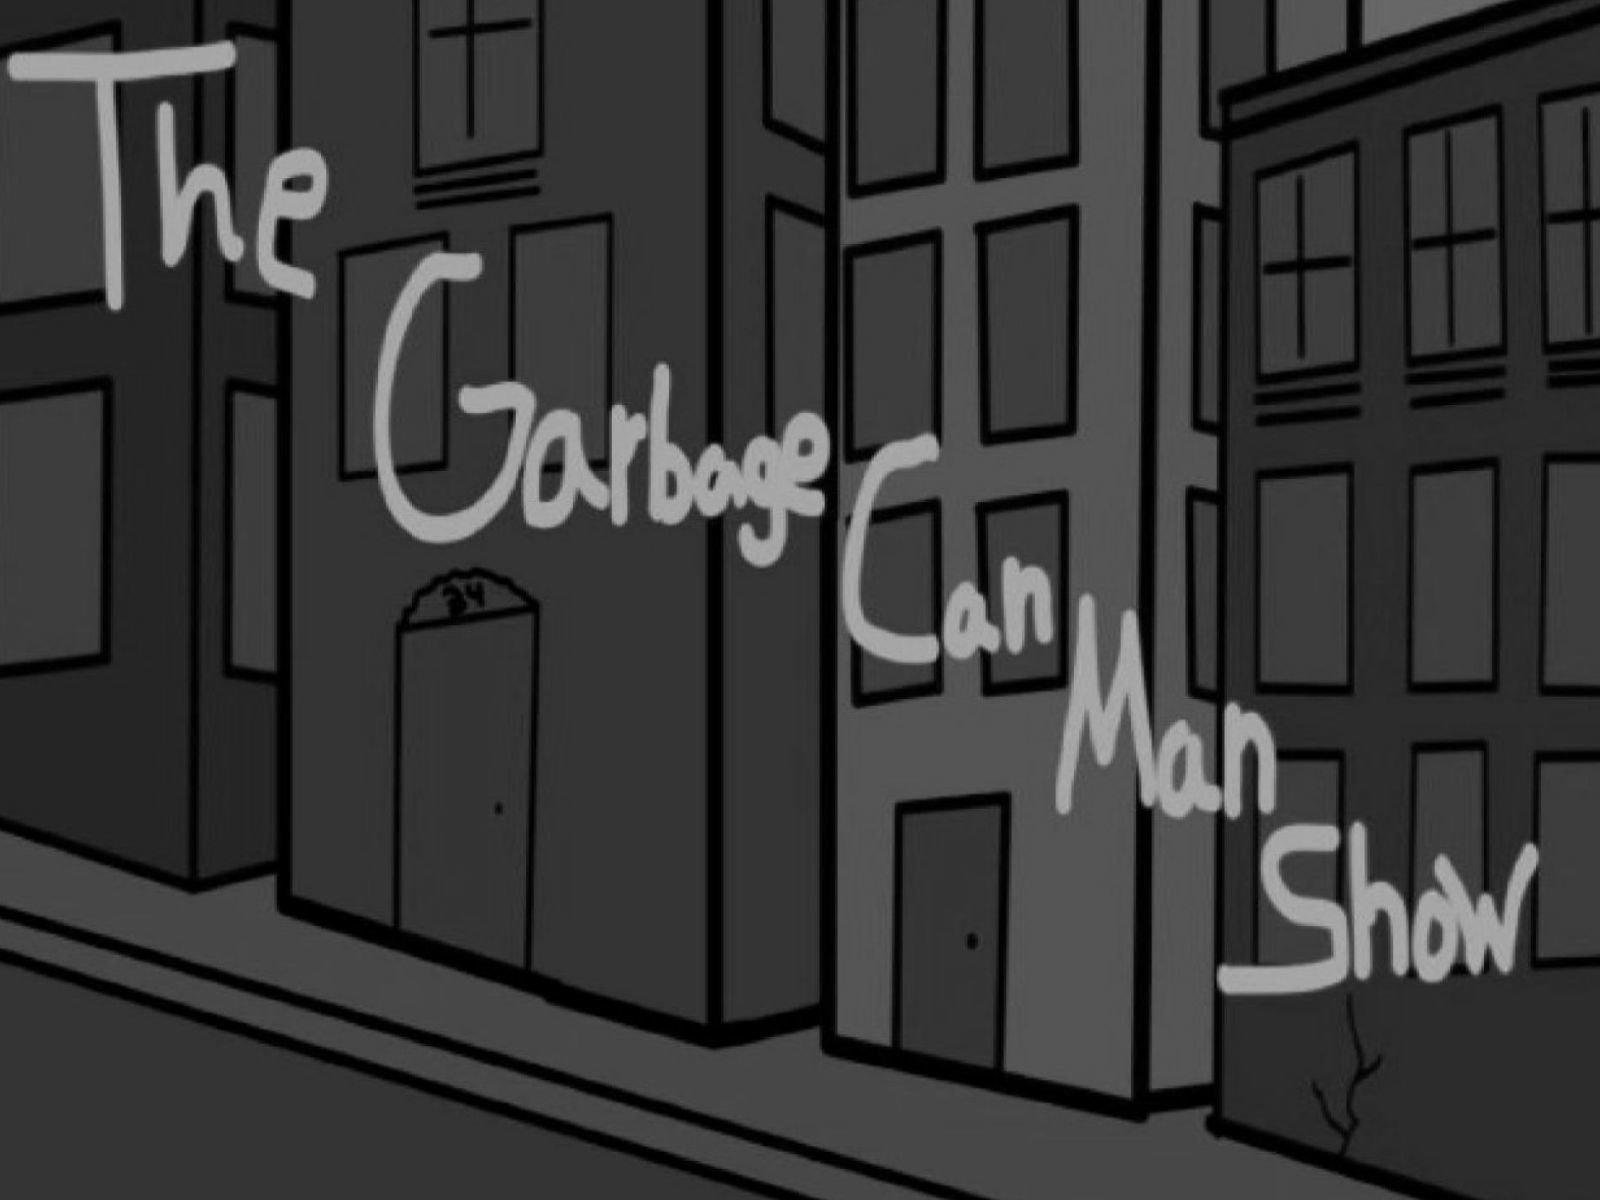 The Garbage Can Man Show - Season 4